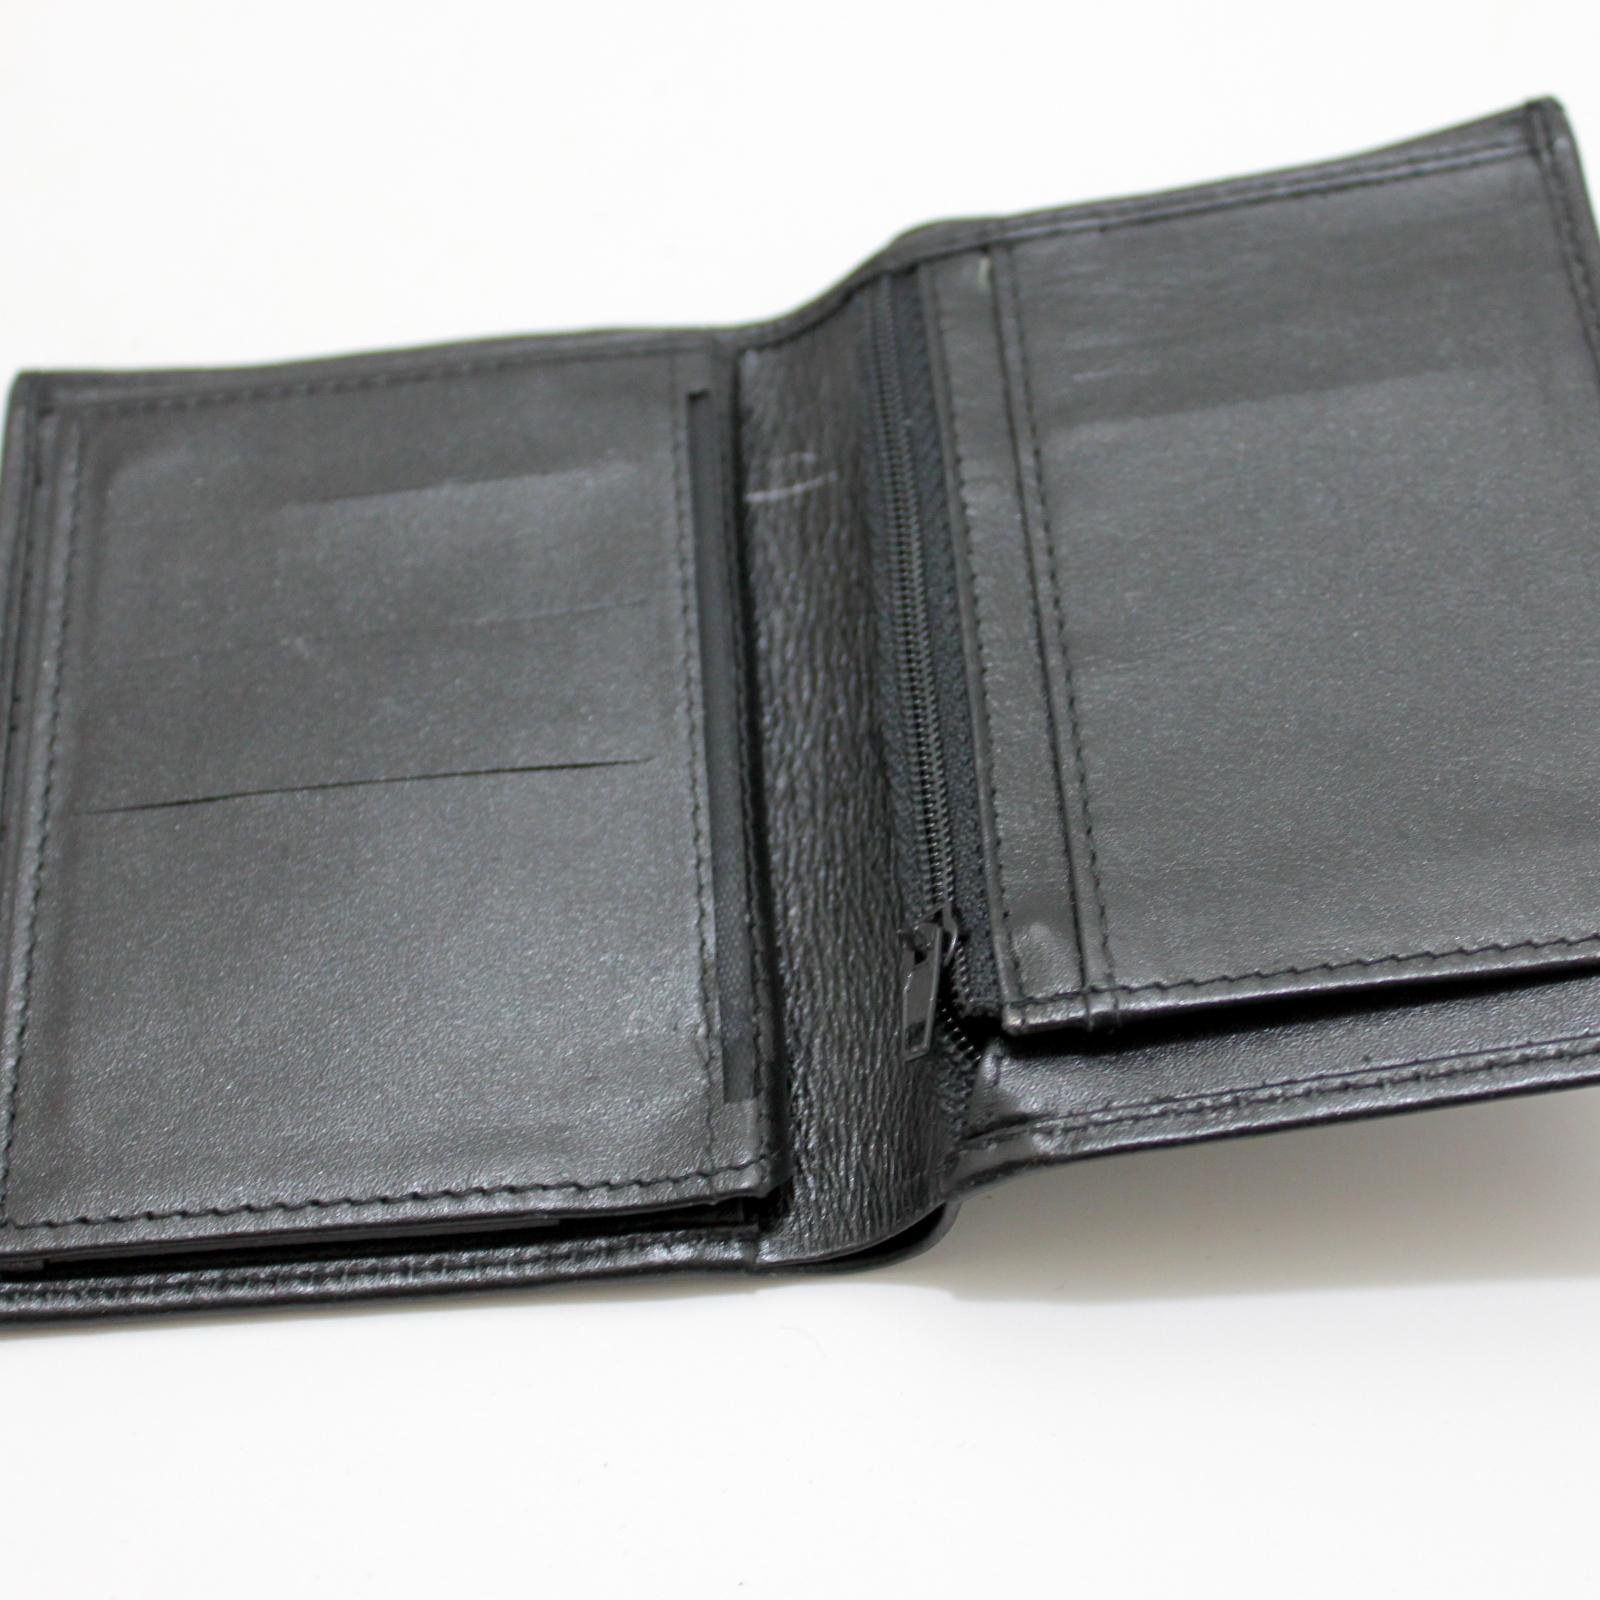 F1 Nitro Wallet (Red) by Alakazam Magic